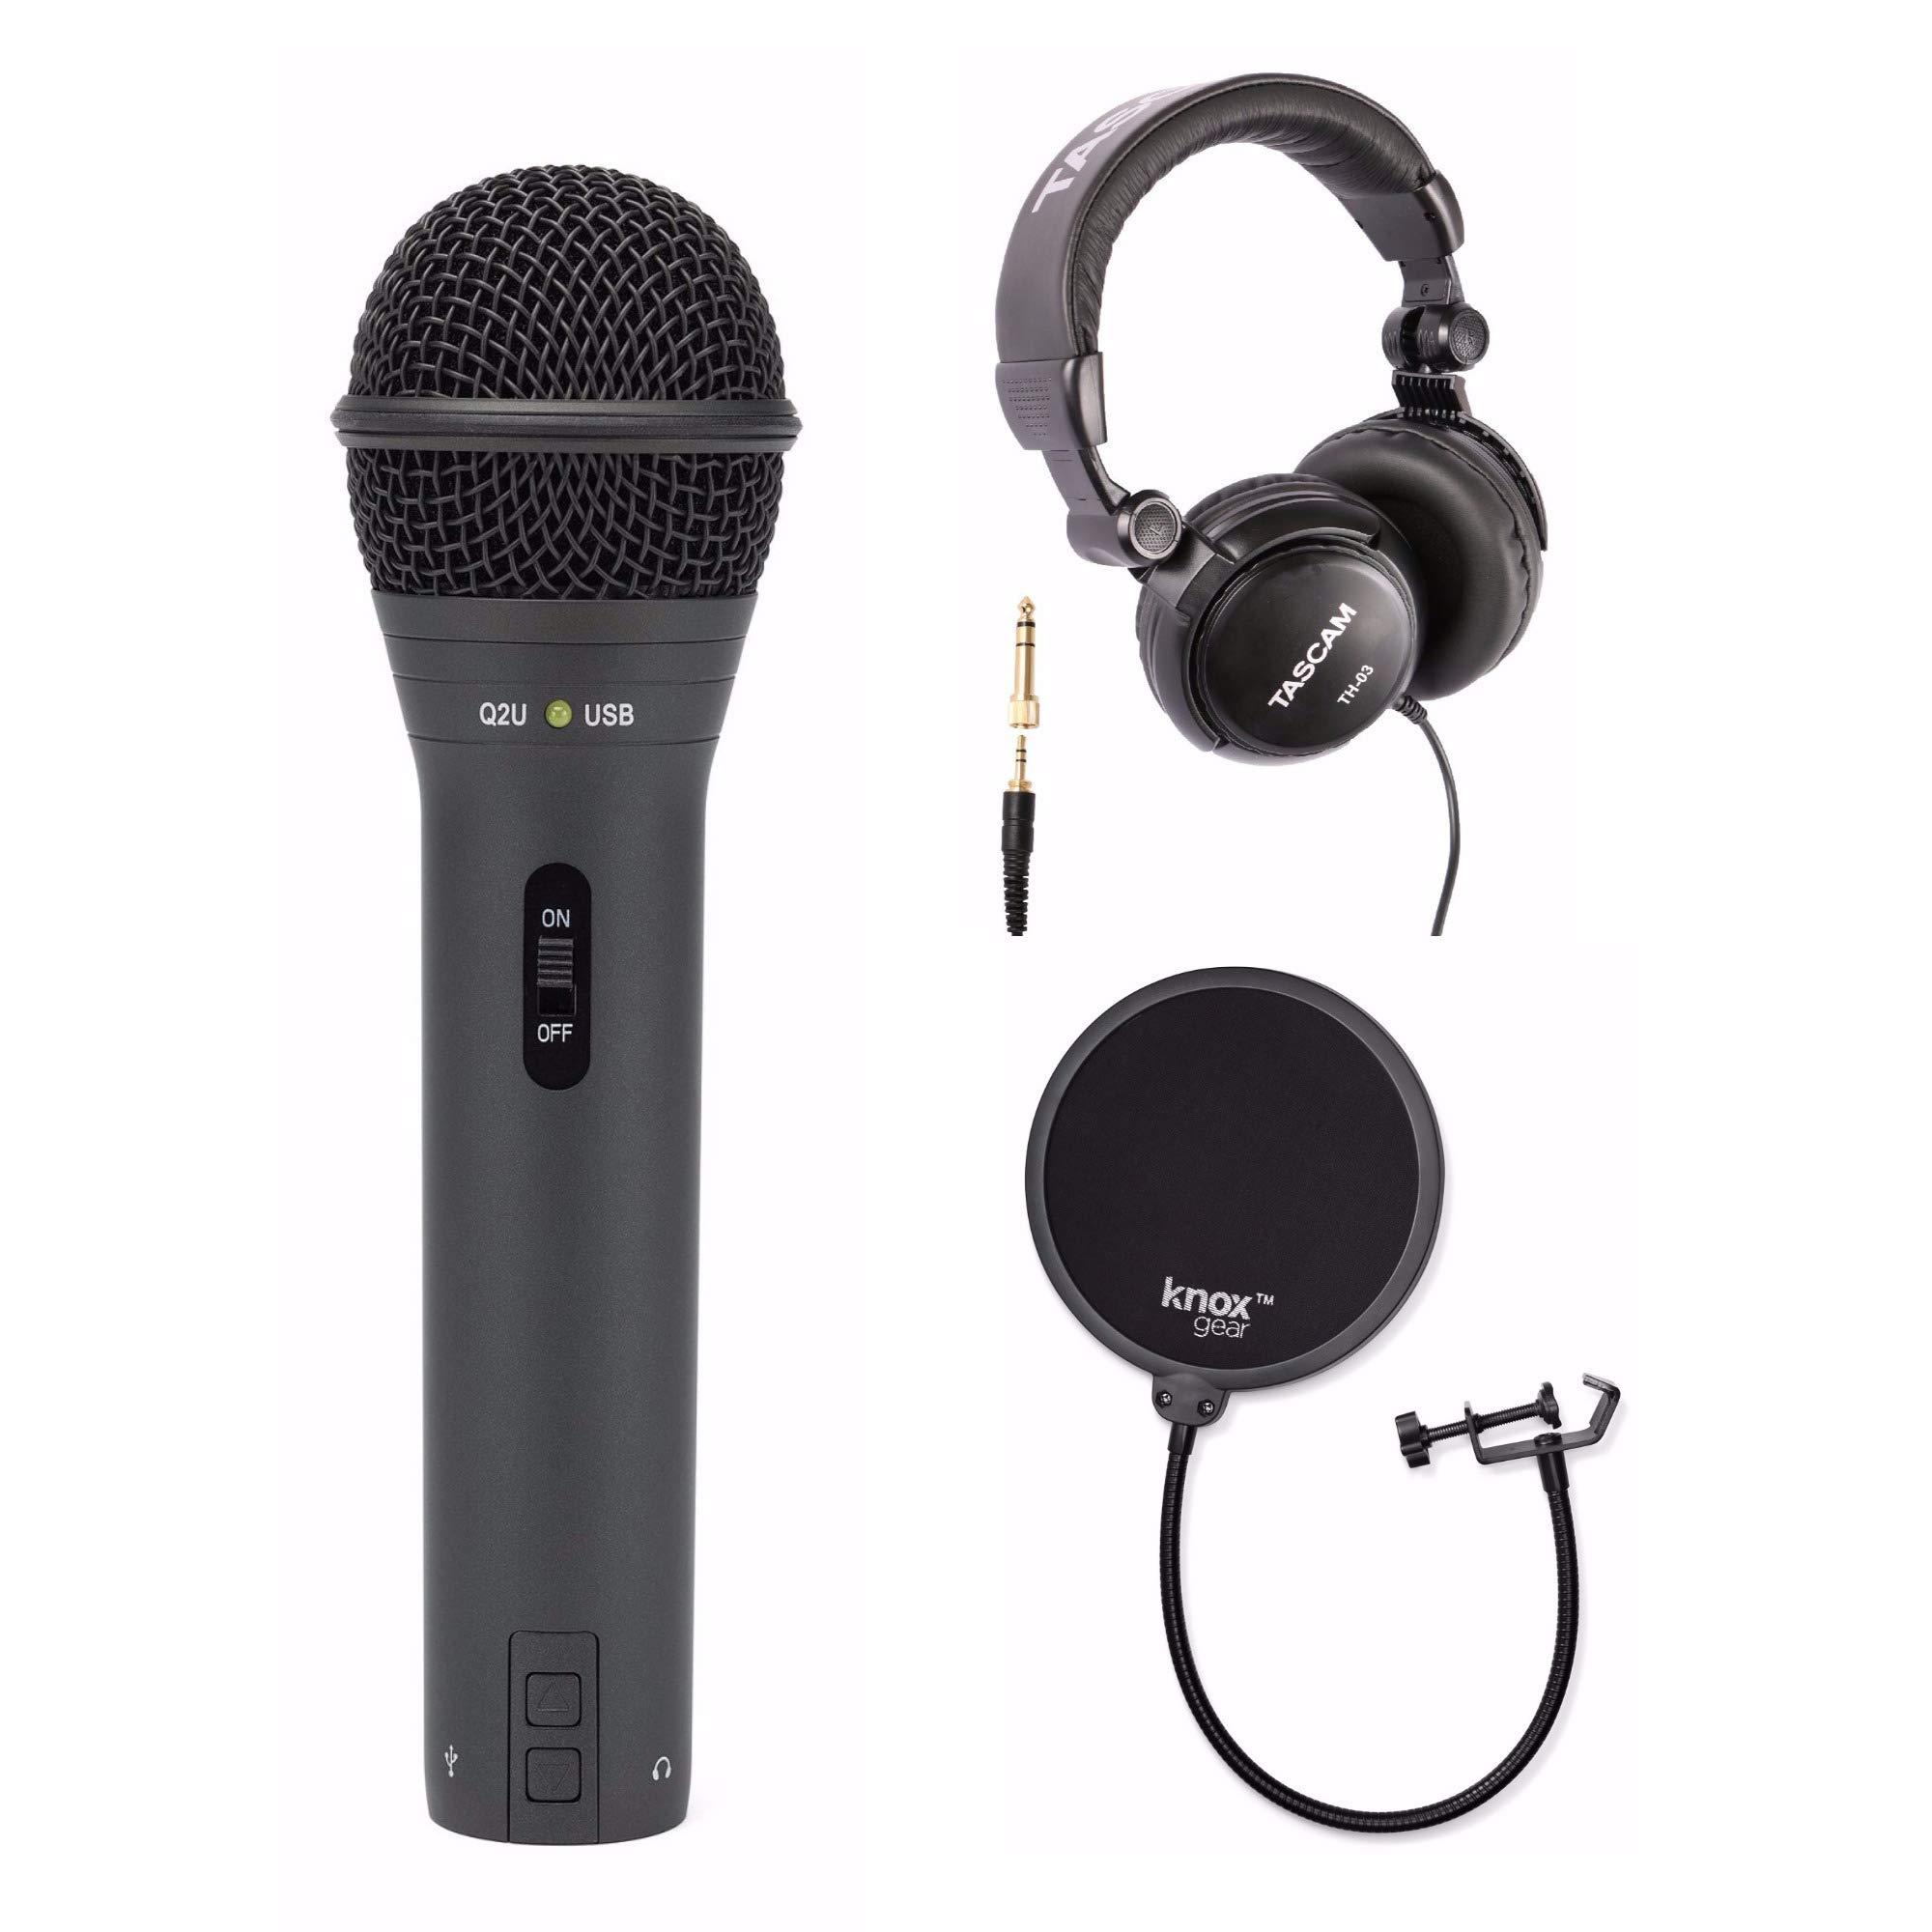 Samson Q2U Black Handheld Dynamic USB Microphone with Knox Pop Filter & Full Size Headphones by Samson Technologies